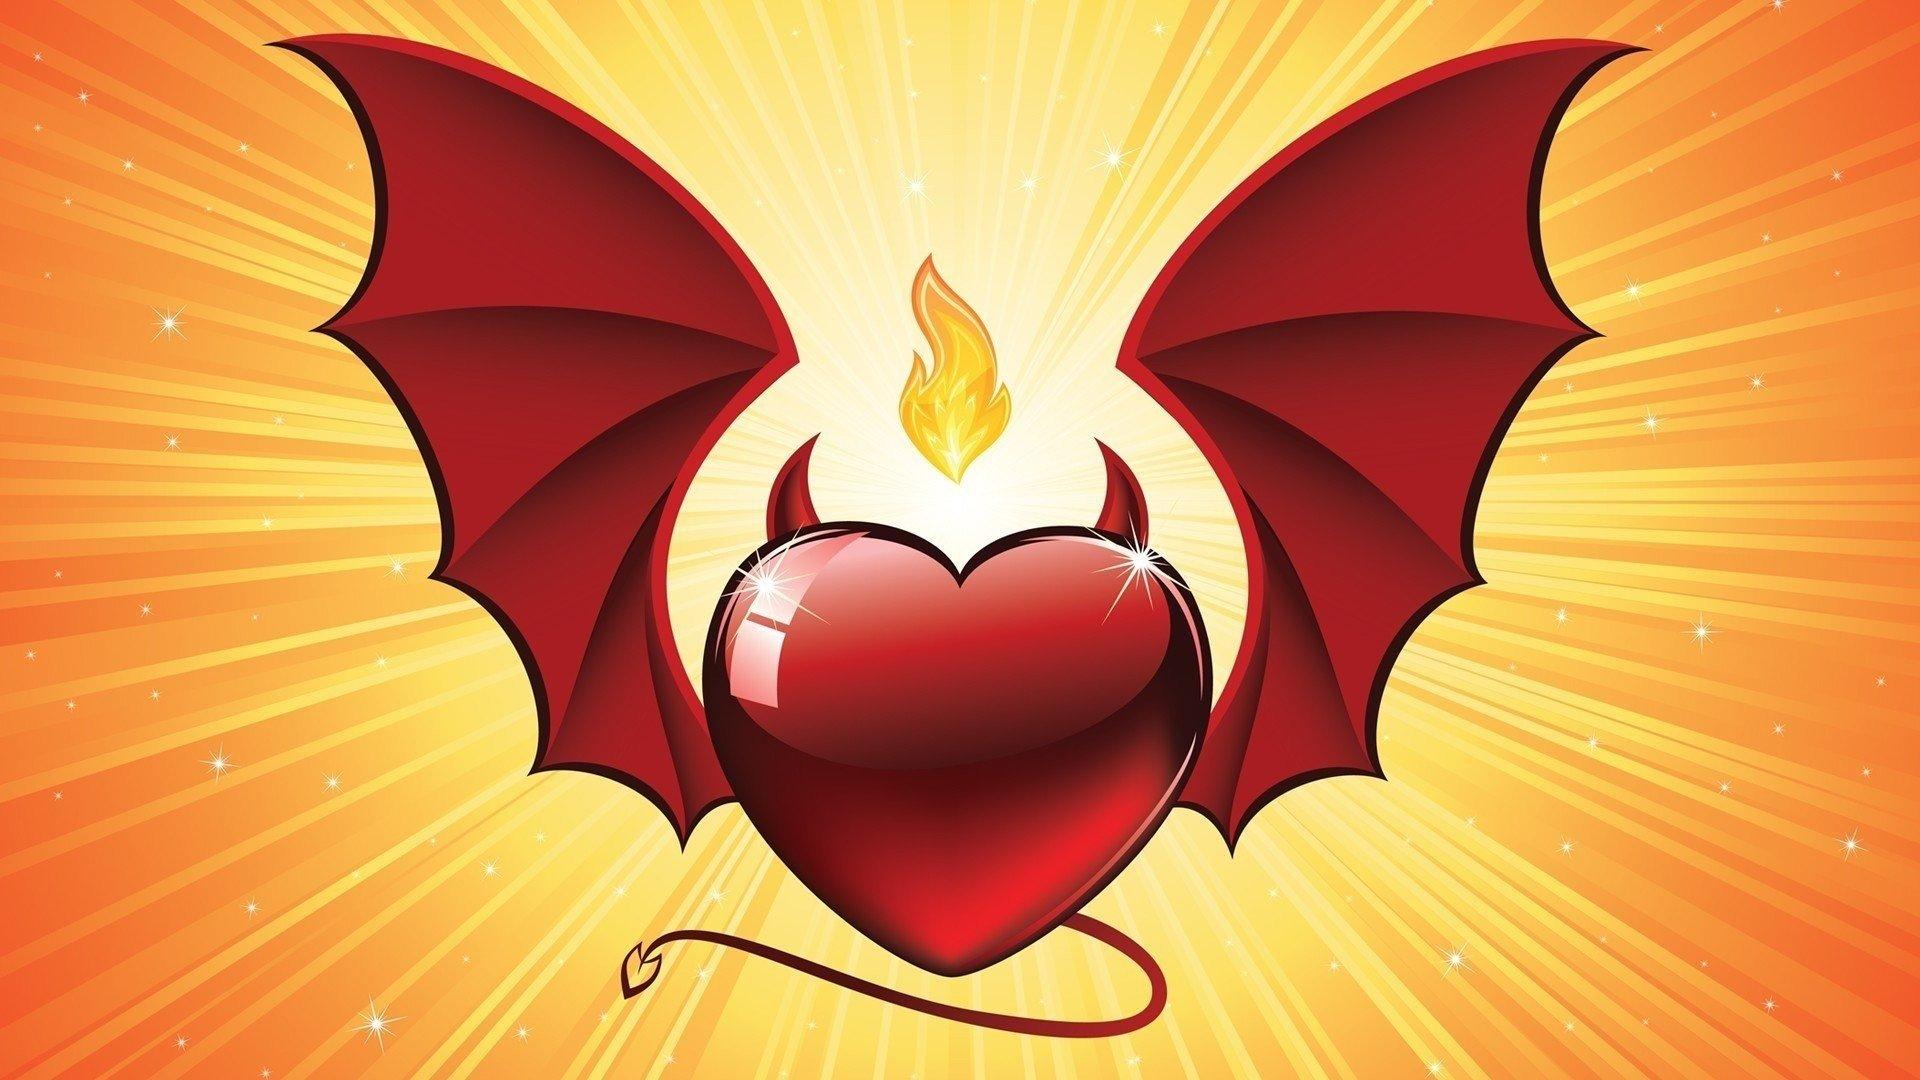 Wings Of Fire Wallpaper Download